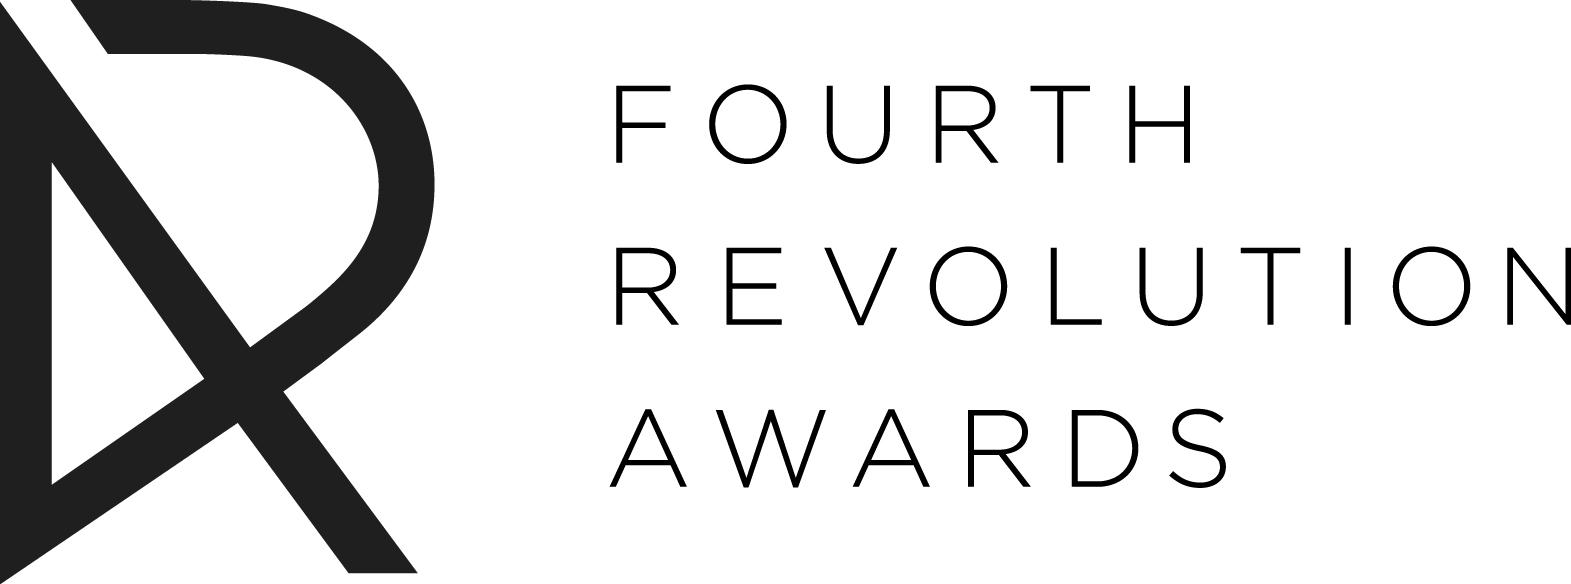 Fourth Revolution Awards Ceremony